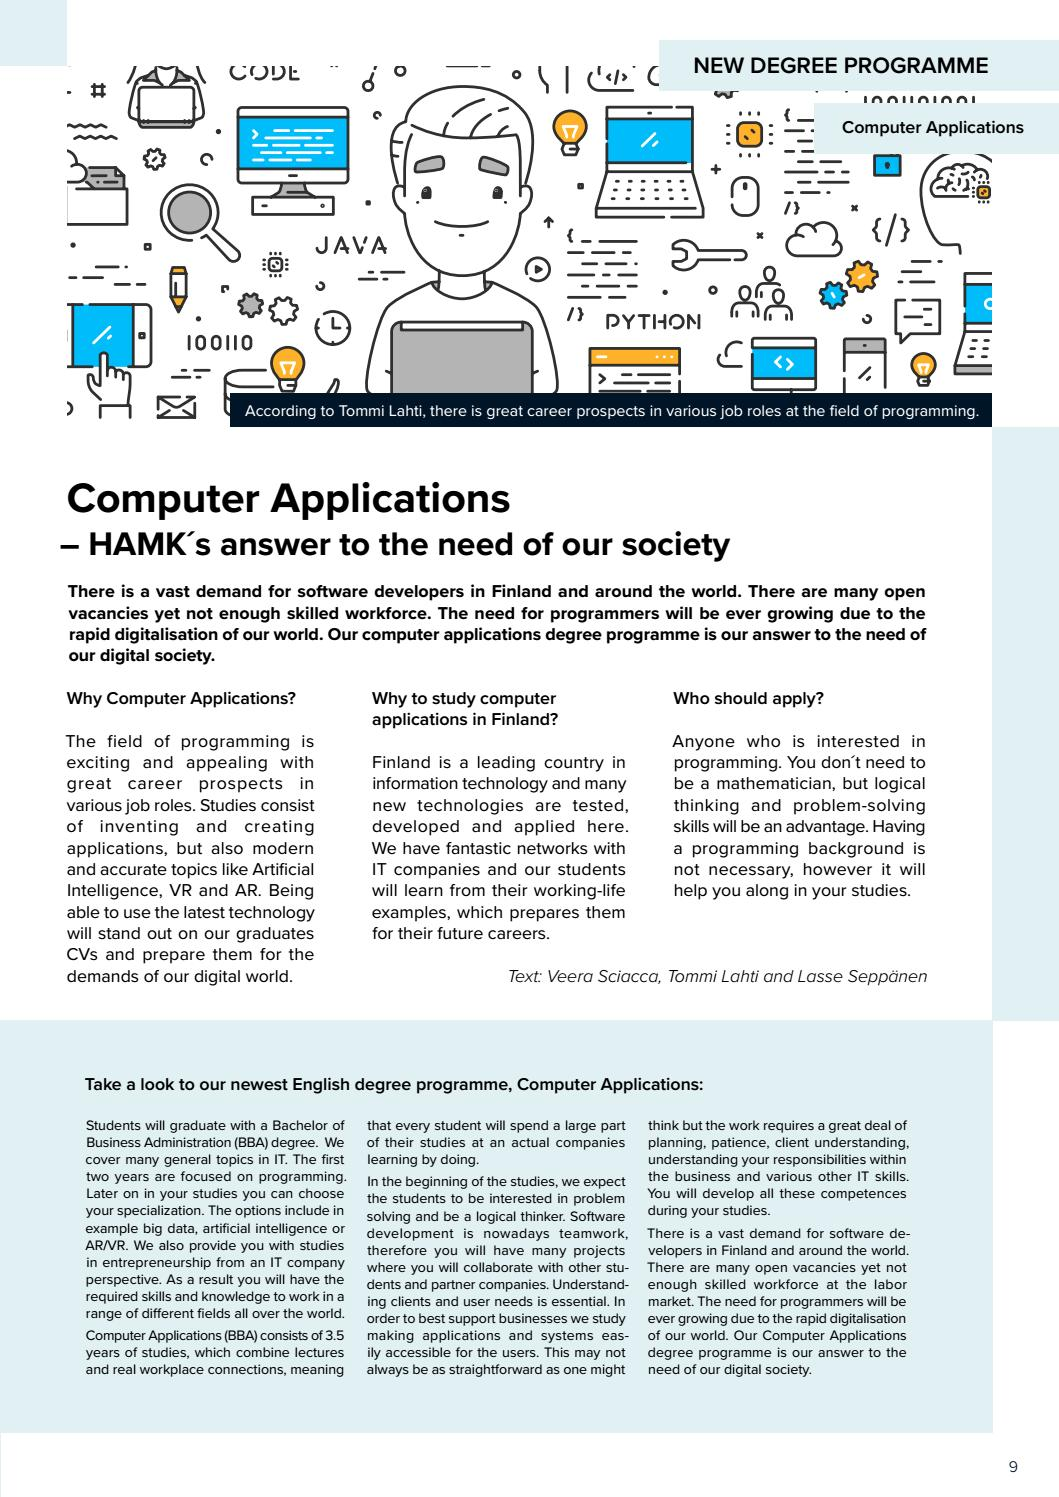 HAMK Stories International Edition 2019 by HAMK Häme University of